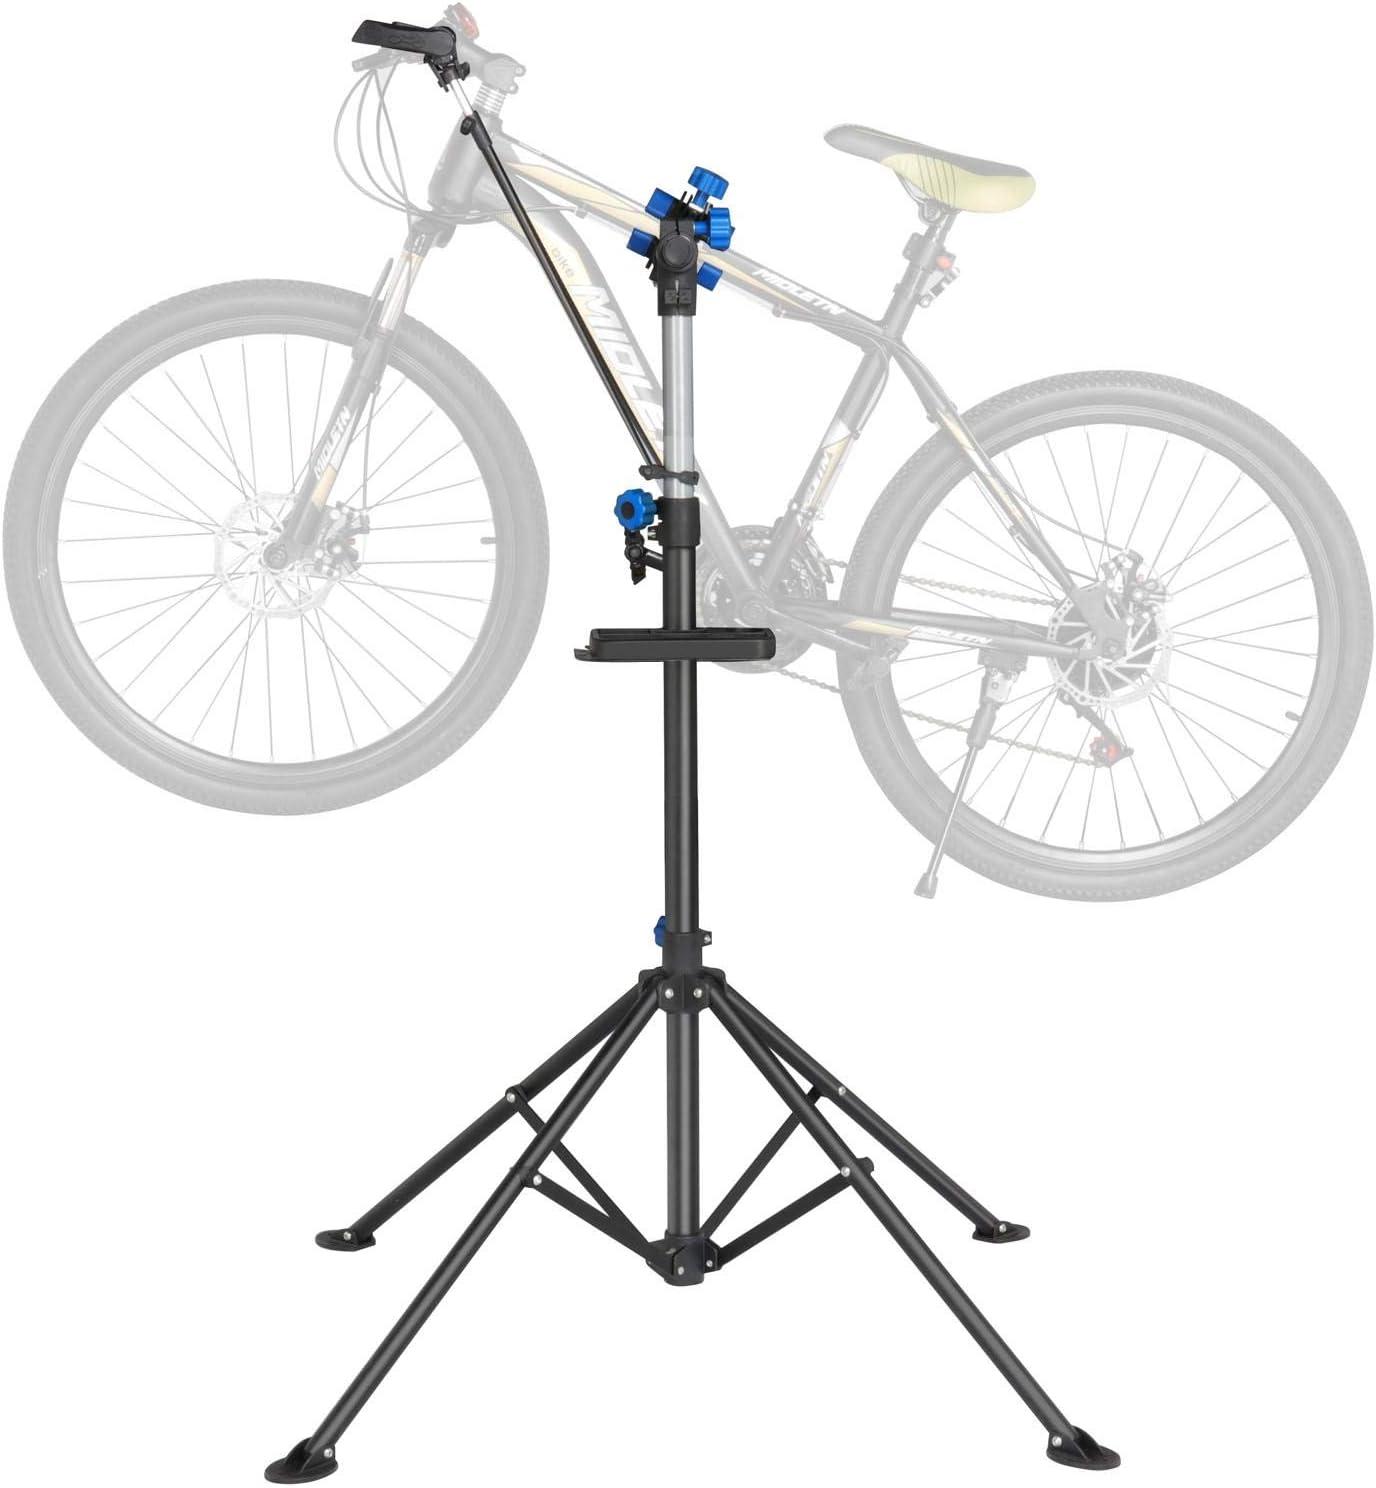 Bicicleta mantenimiento reparar Popamazing trabajo plegable ...